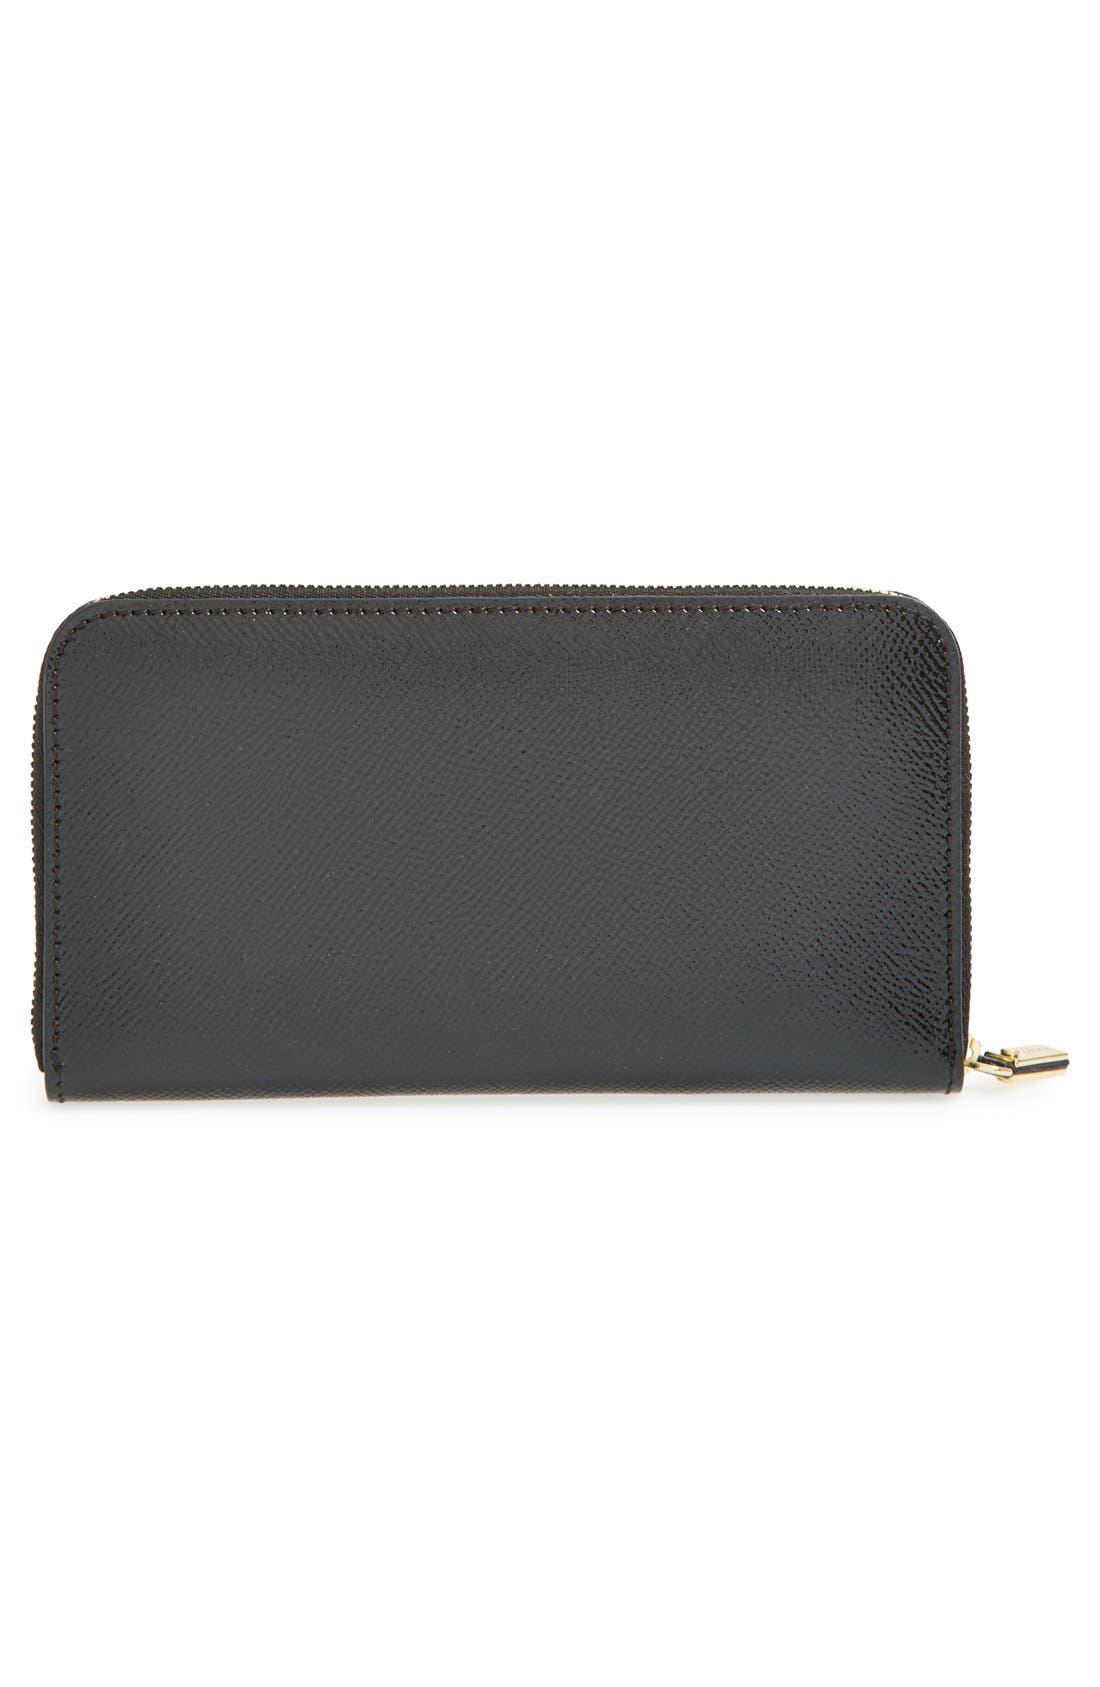 BURBERRY,                             'Elmore - London Leather' Zip Around Wallet,                             Alternate thumbnail 2, color,                             001